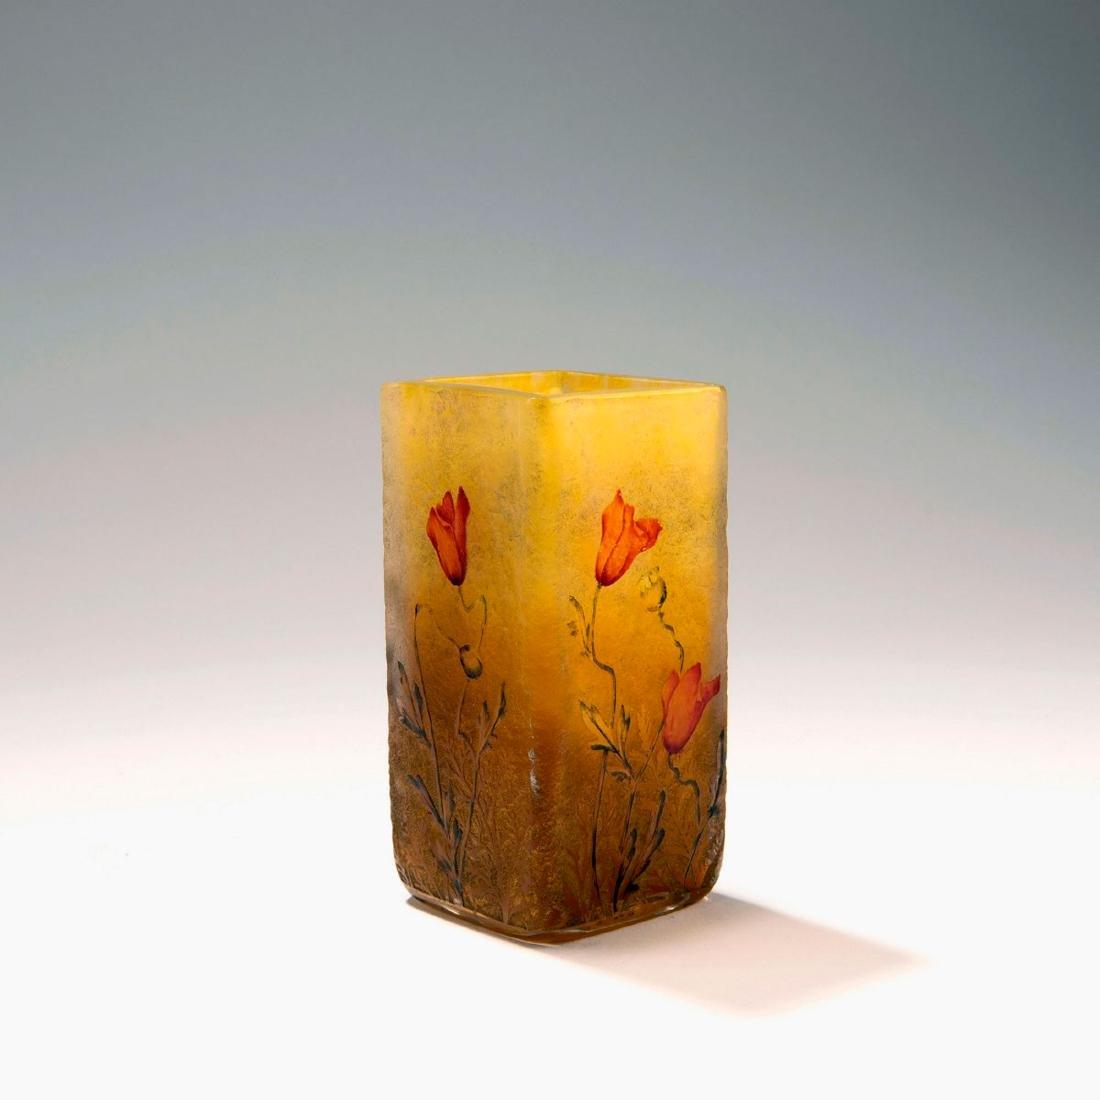 Small 'Coquelicots' vase, c. 1900